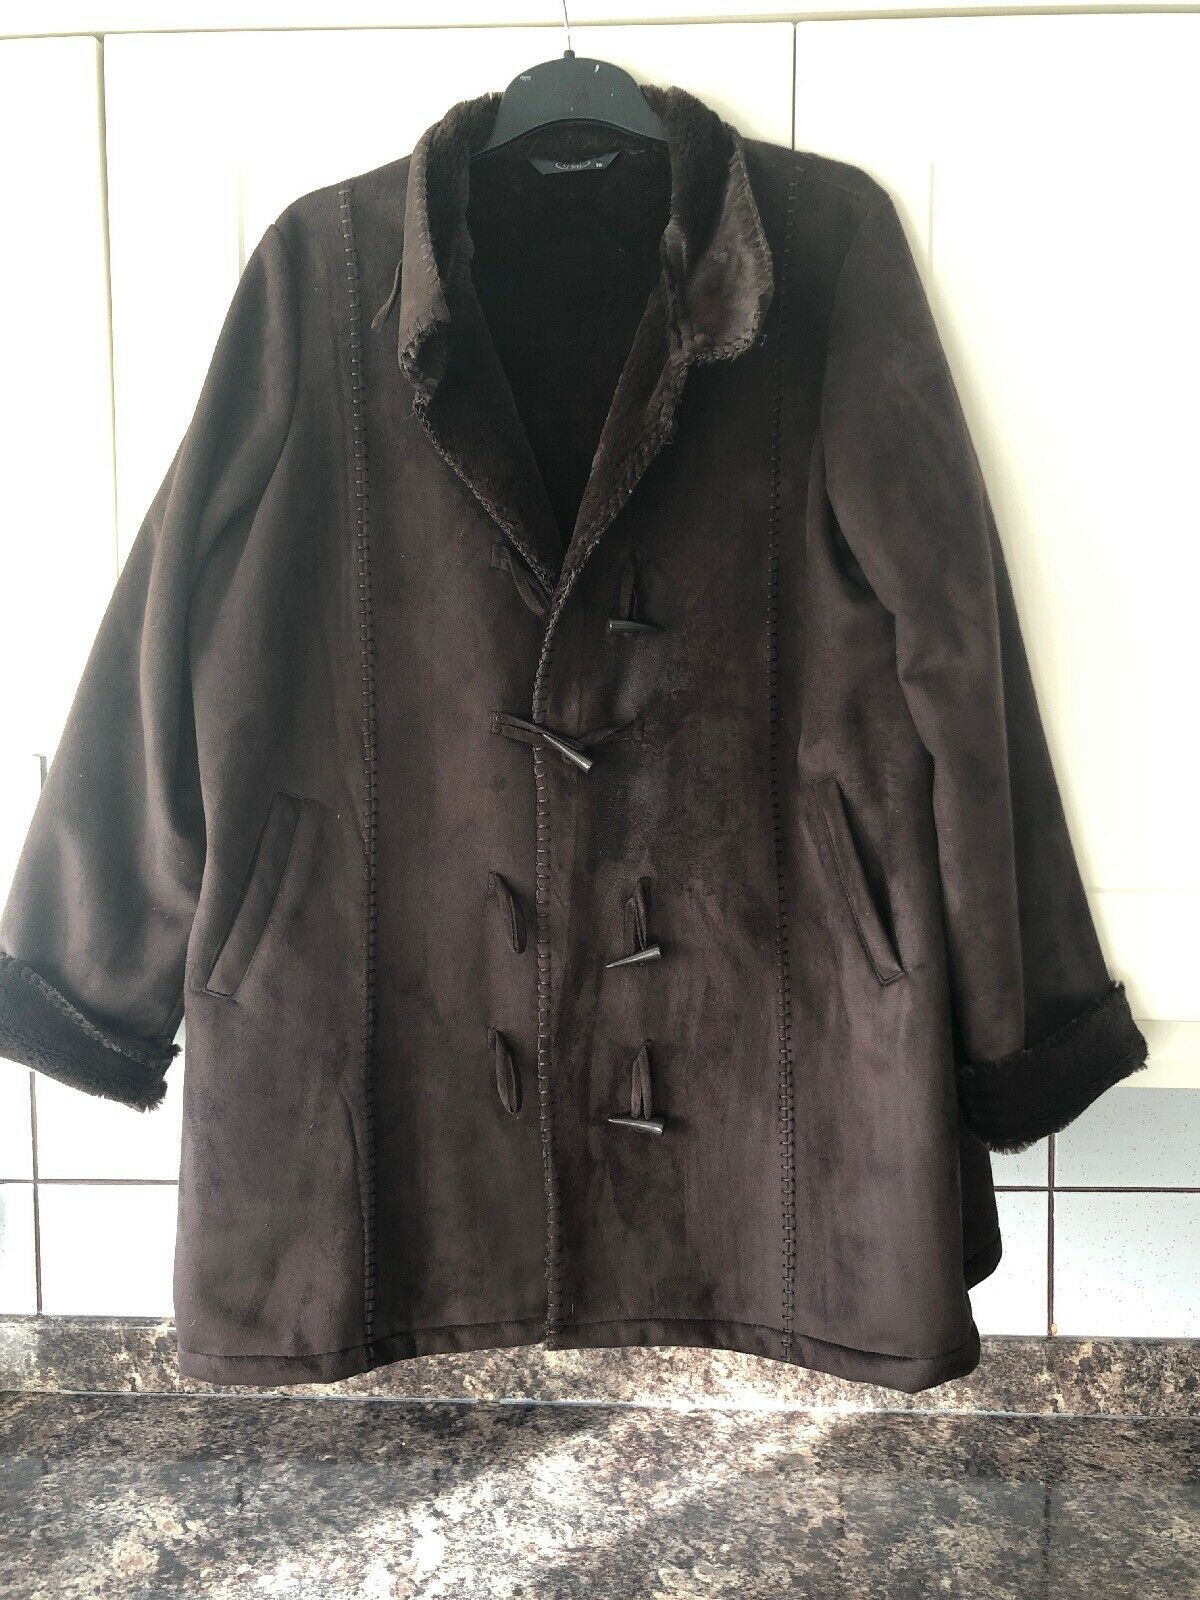 Ladies Size 18 Brown Suede Effect Short Coat From Bonmarche